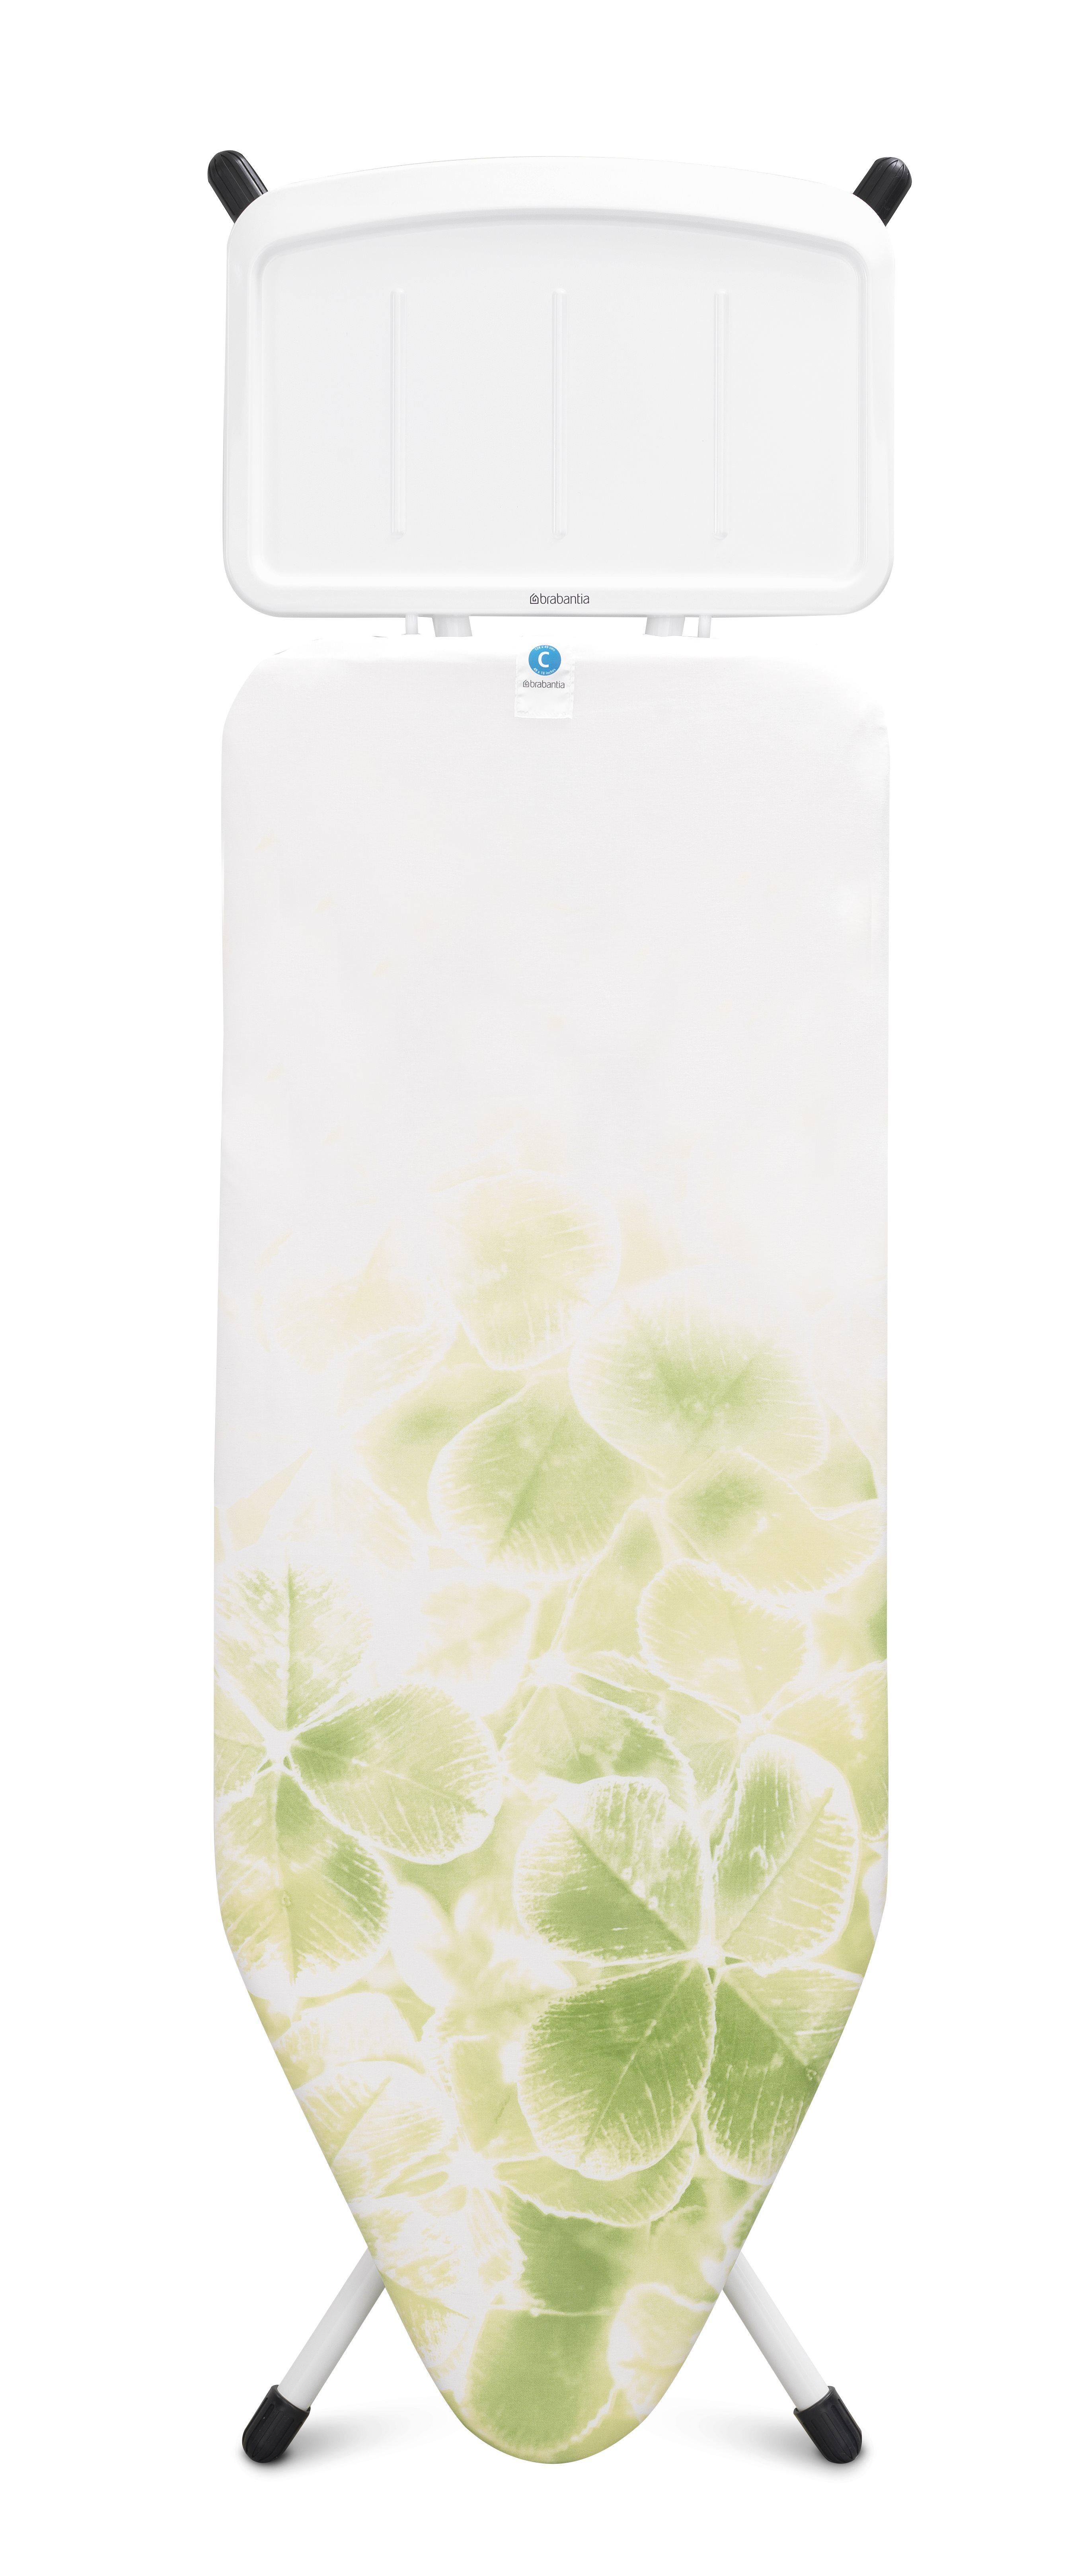 BRABANTIA Σιδερώστρα Leaf Clover 124x45cm με Βάση για Ατμοσύστημα - 080.1114/26